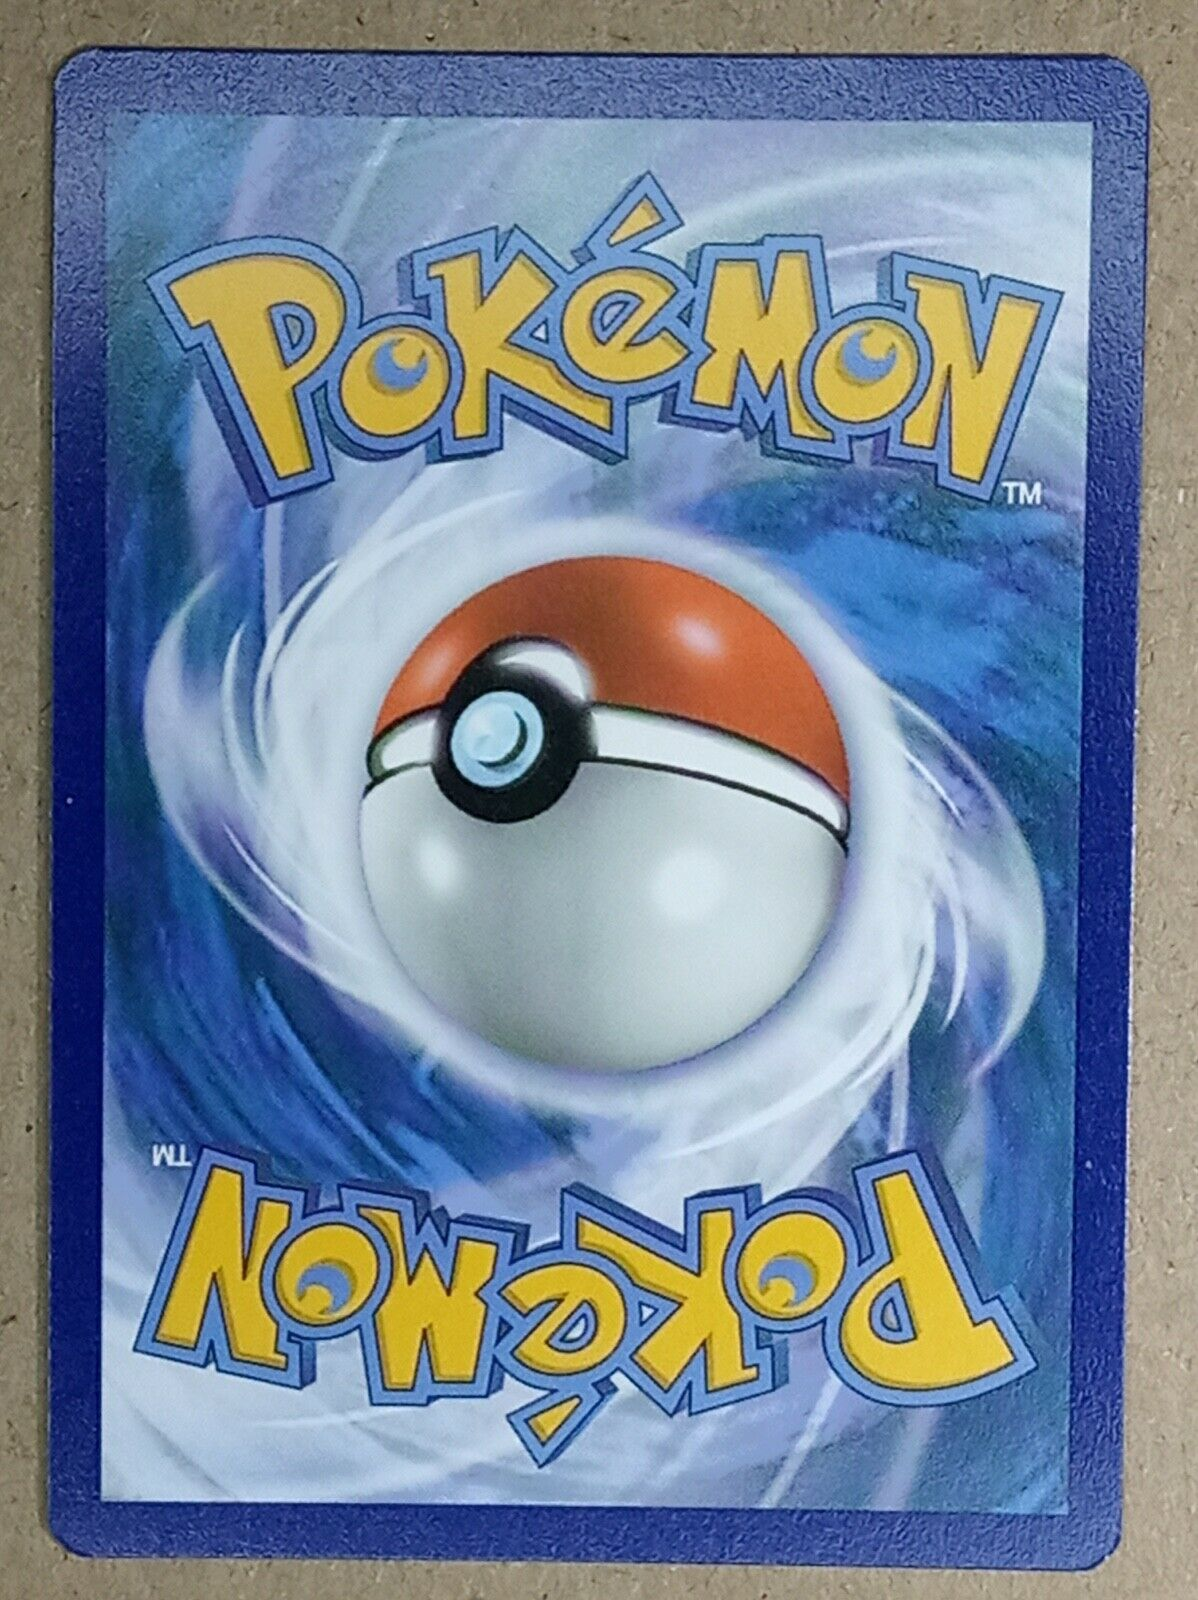 POKEMON CARD - Kommo-o 54/70 - Holo Rare - Dragon Majesty - NM - Image 2